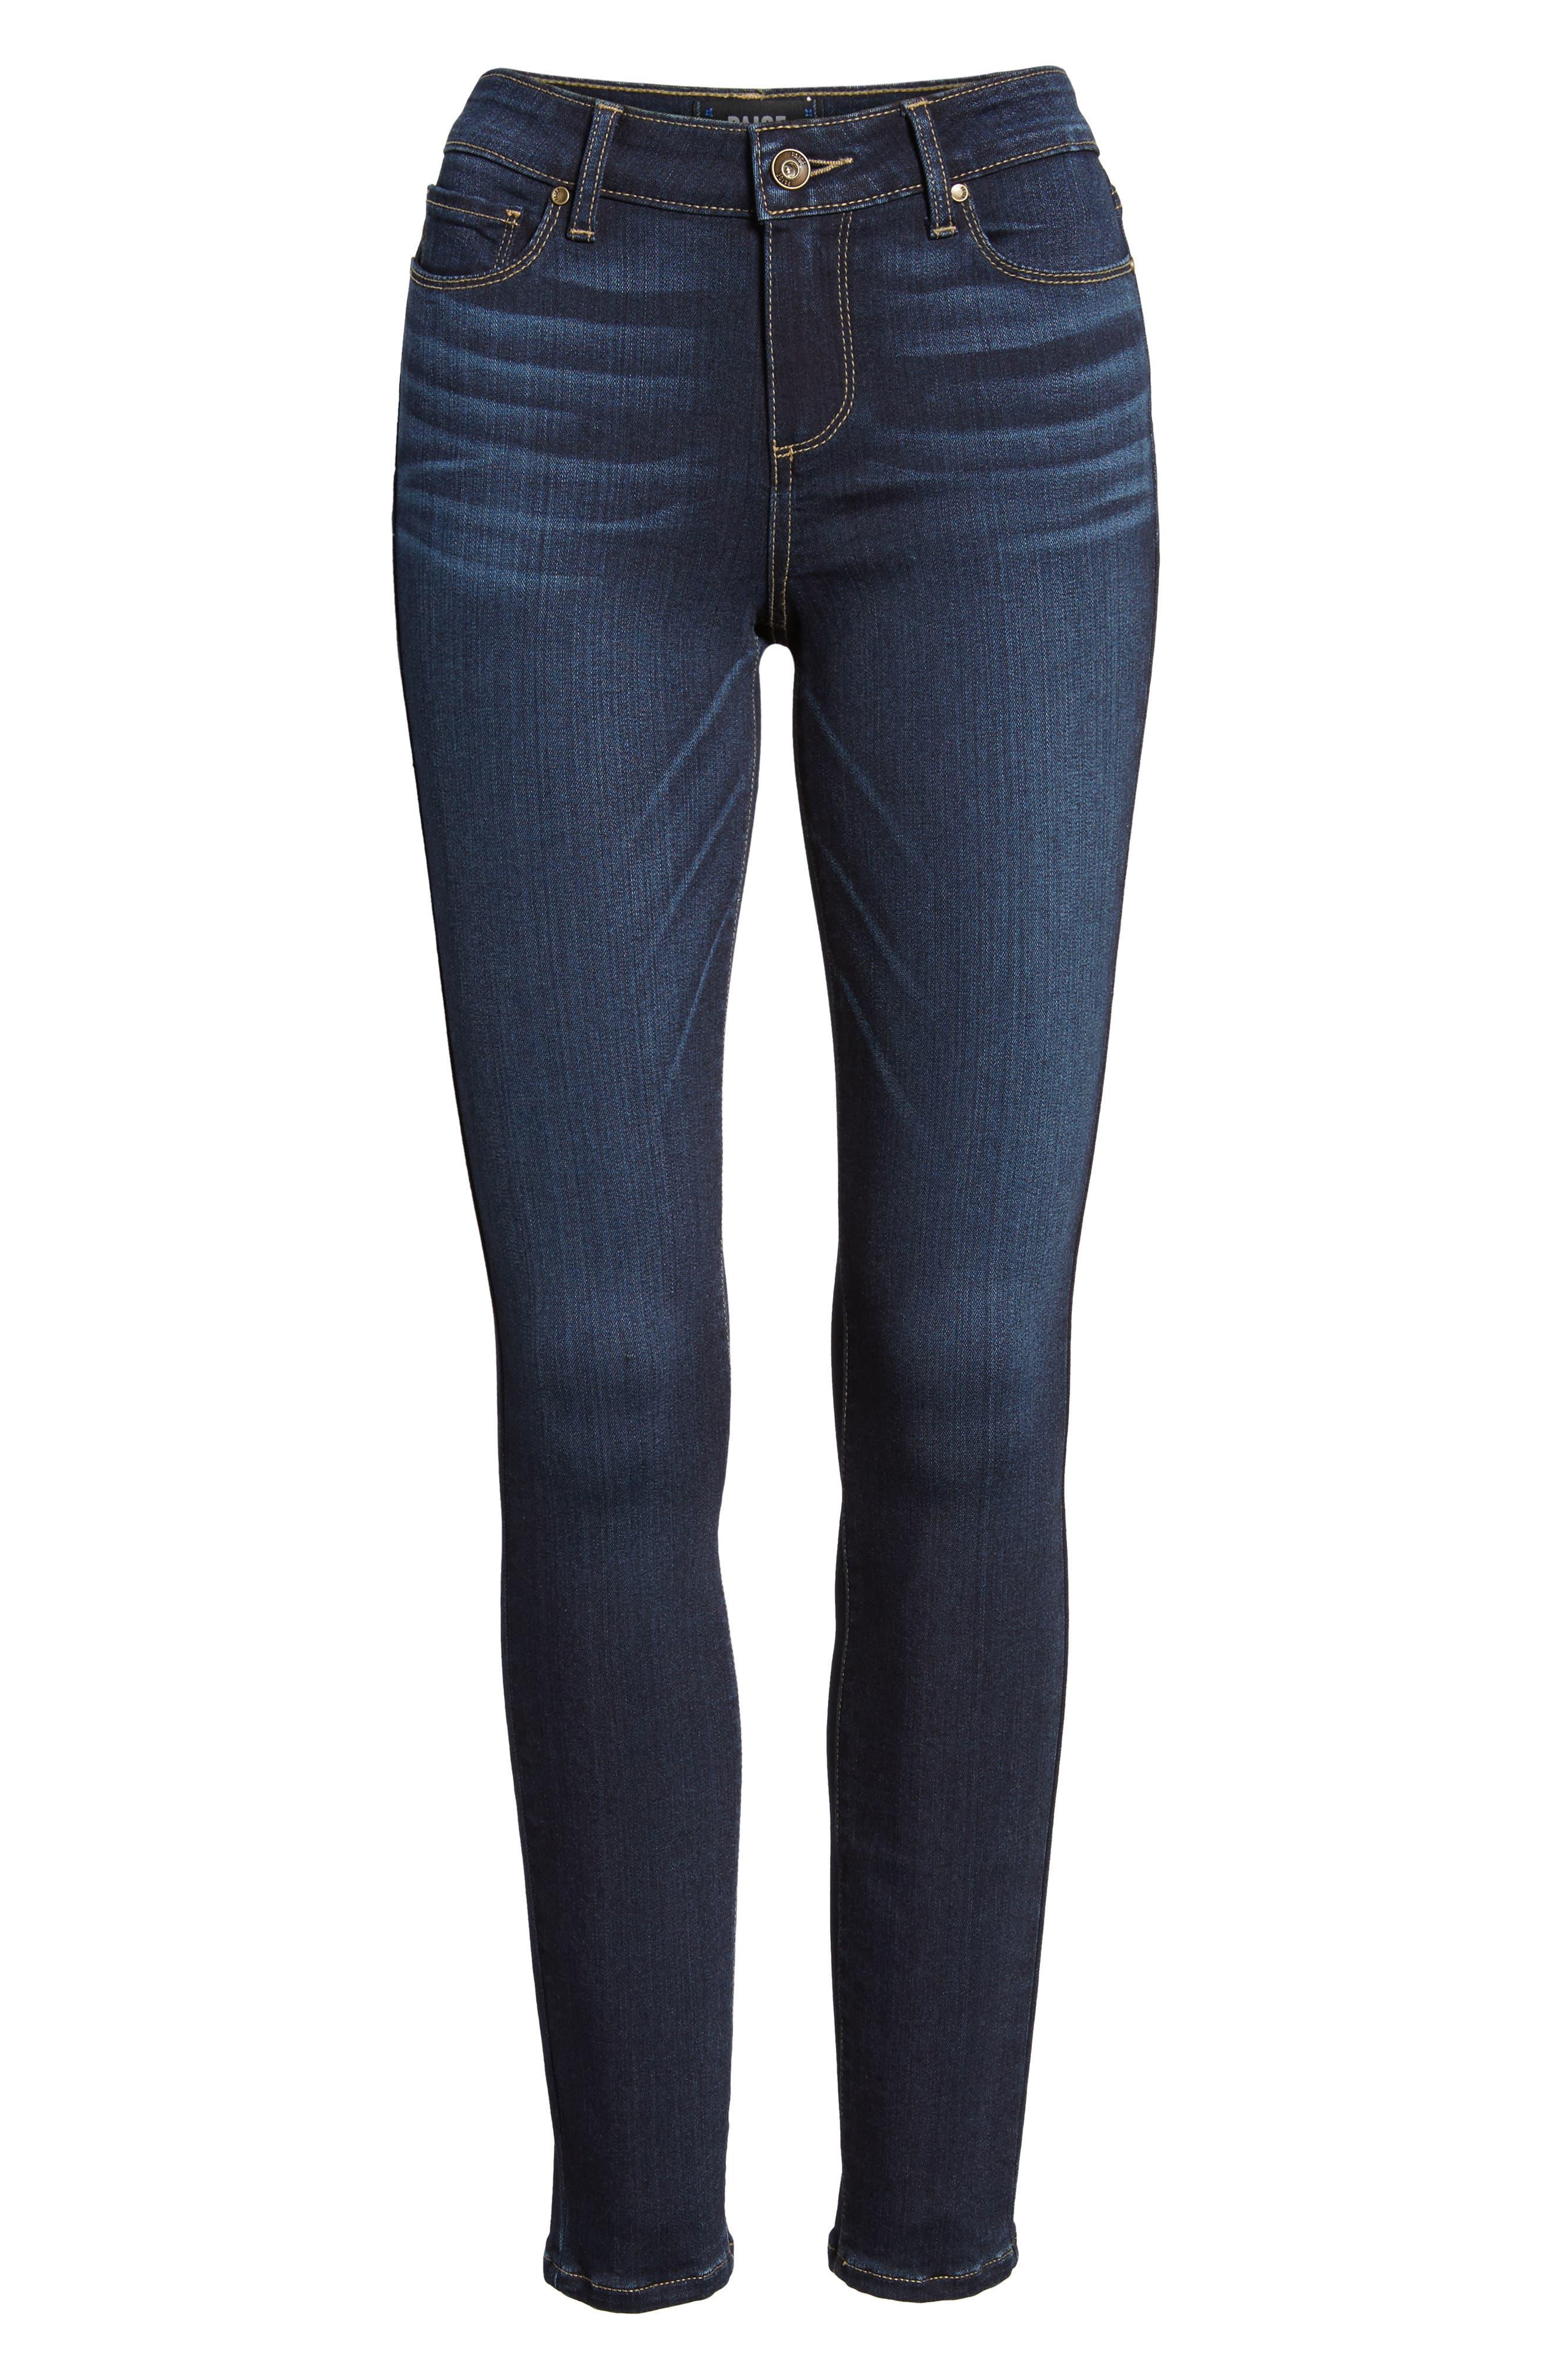 Transcend - Verdugo Ultra Skinny Jeans,                             Alternate thumbnail 7, color,                             Koda